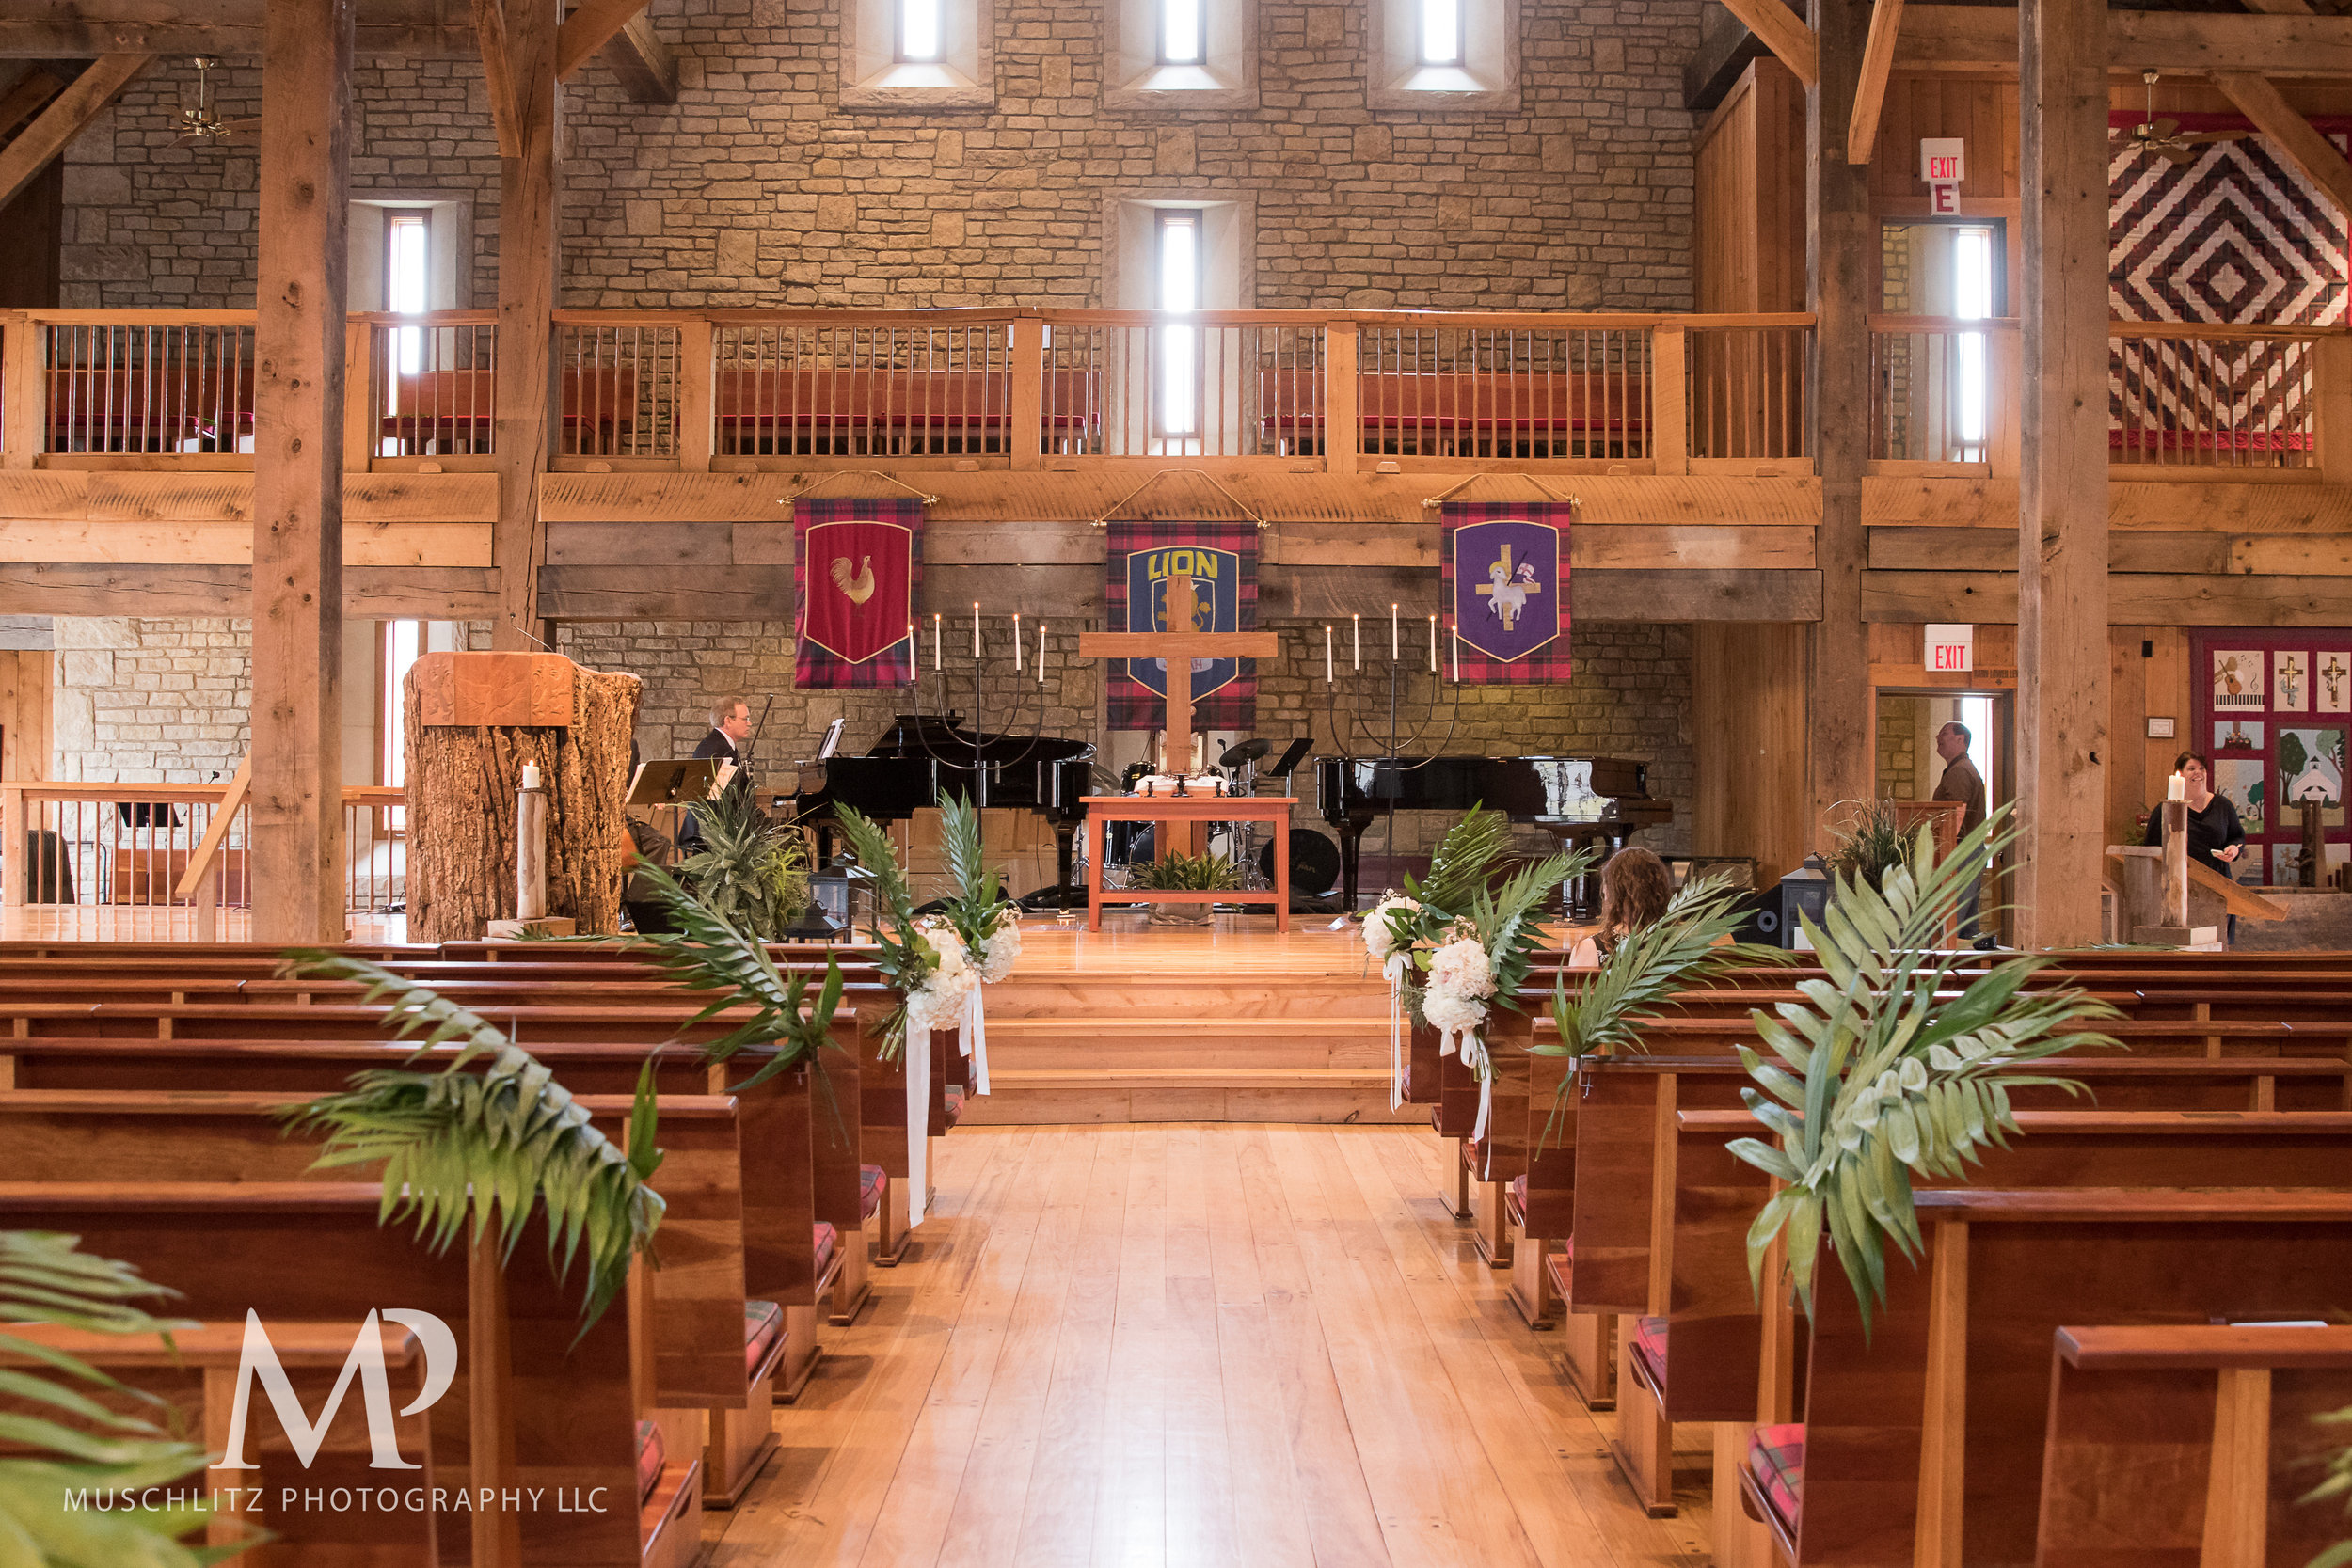 liberty-barn-presbyterian-church-wedding-delaware-columbus-ohio-muschlitz-photography-022.JPG